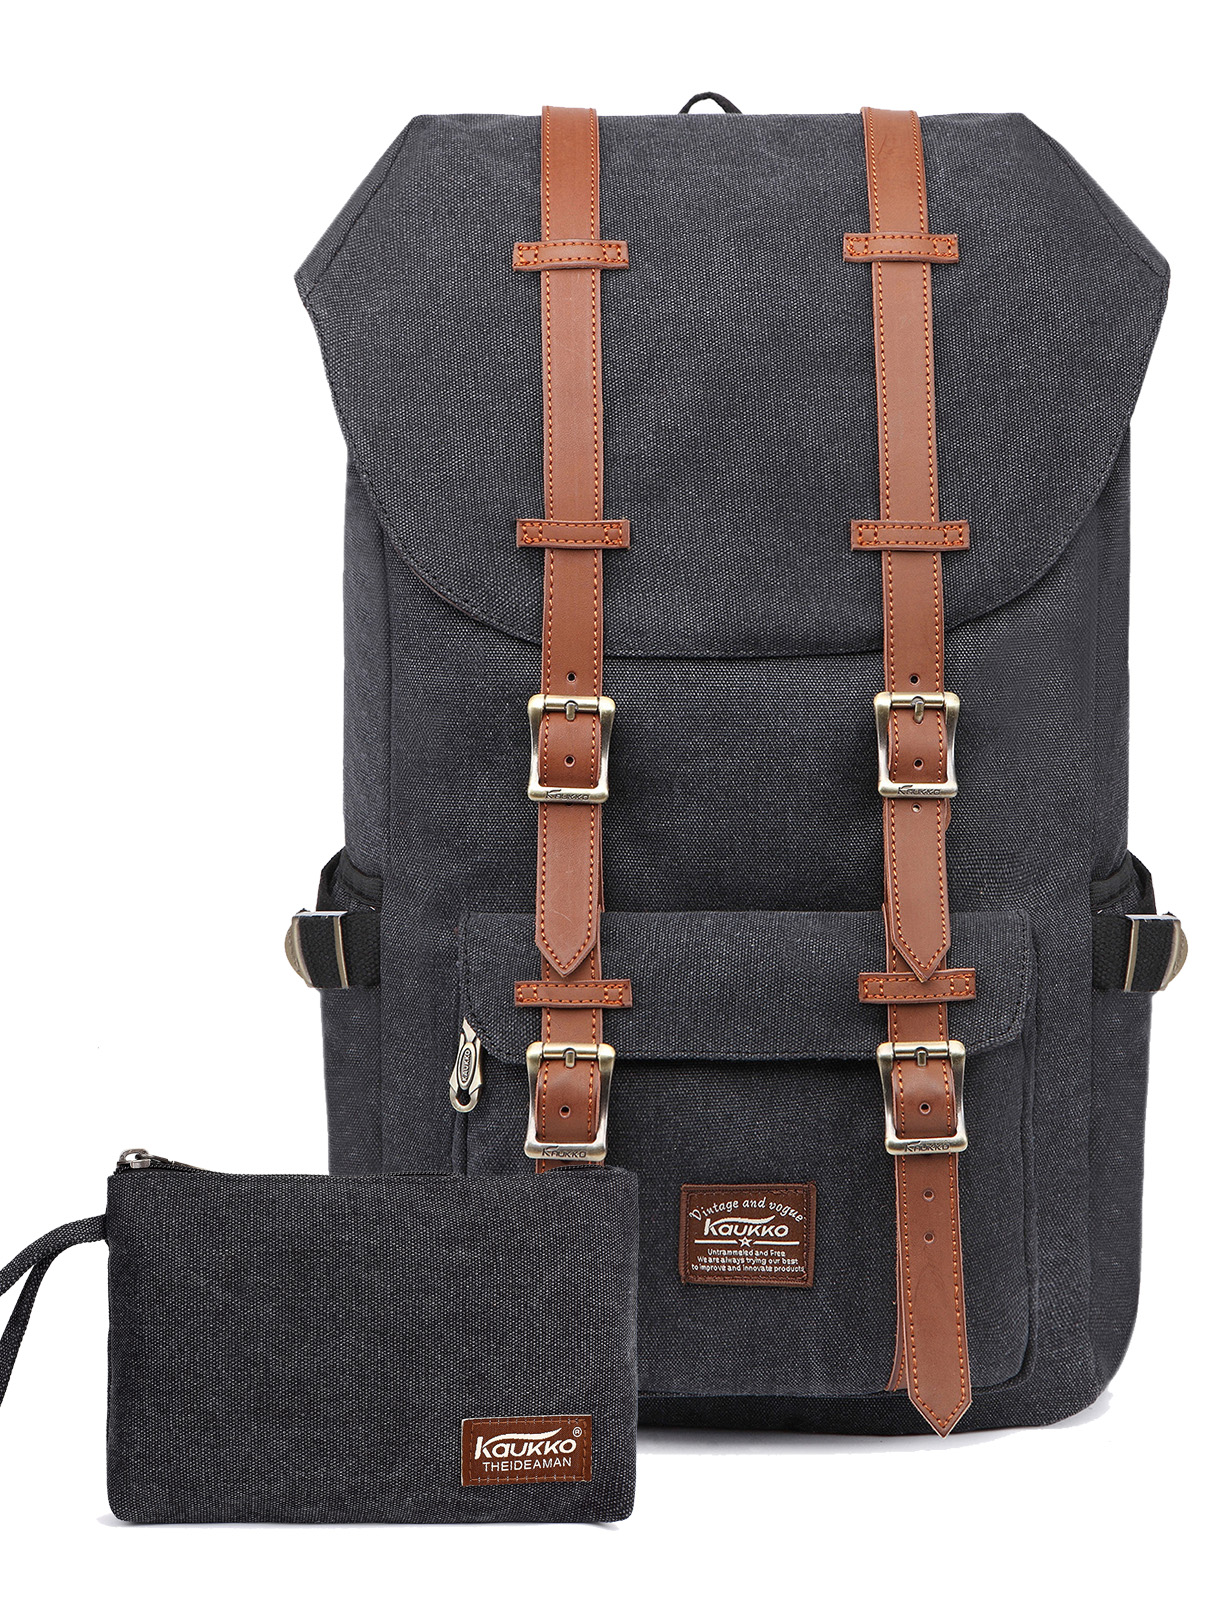 Laptop Outdoor Backpack Travel Hiking Camping Rucksack Casual Daypack KAUKKO 485a2def6e9af